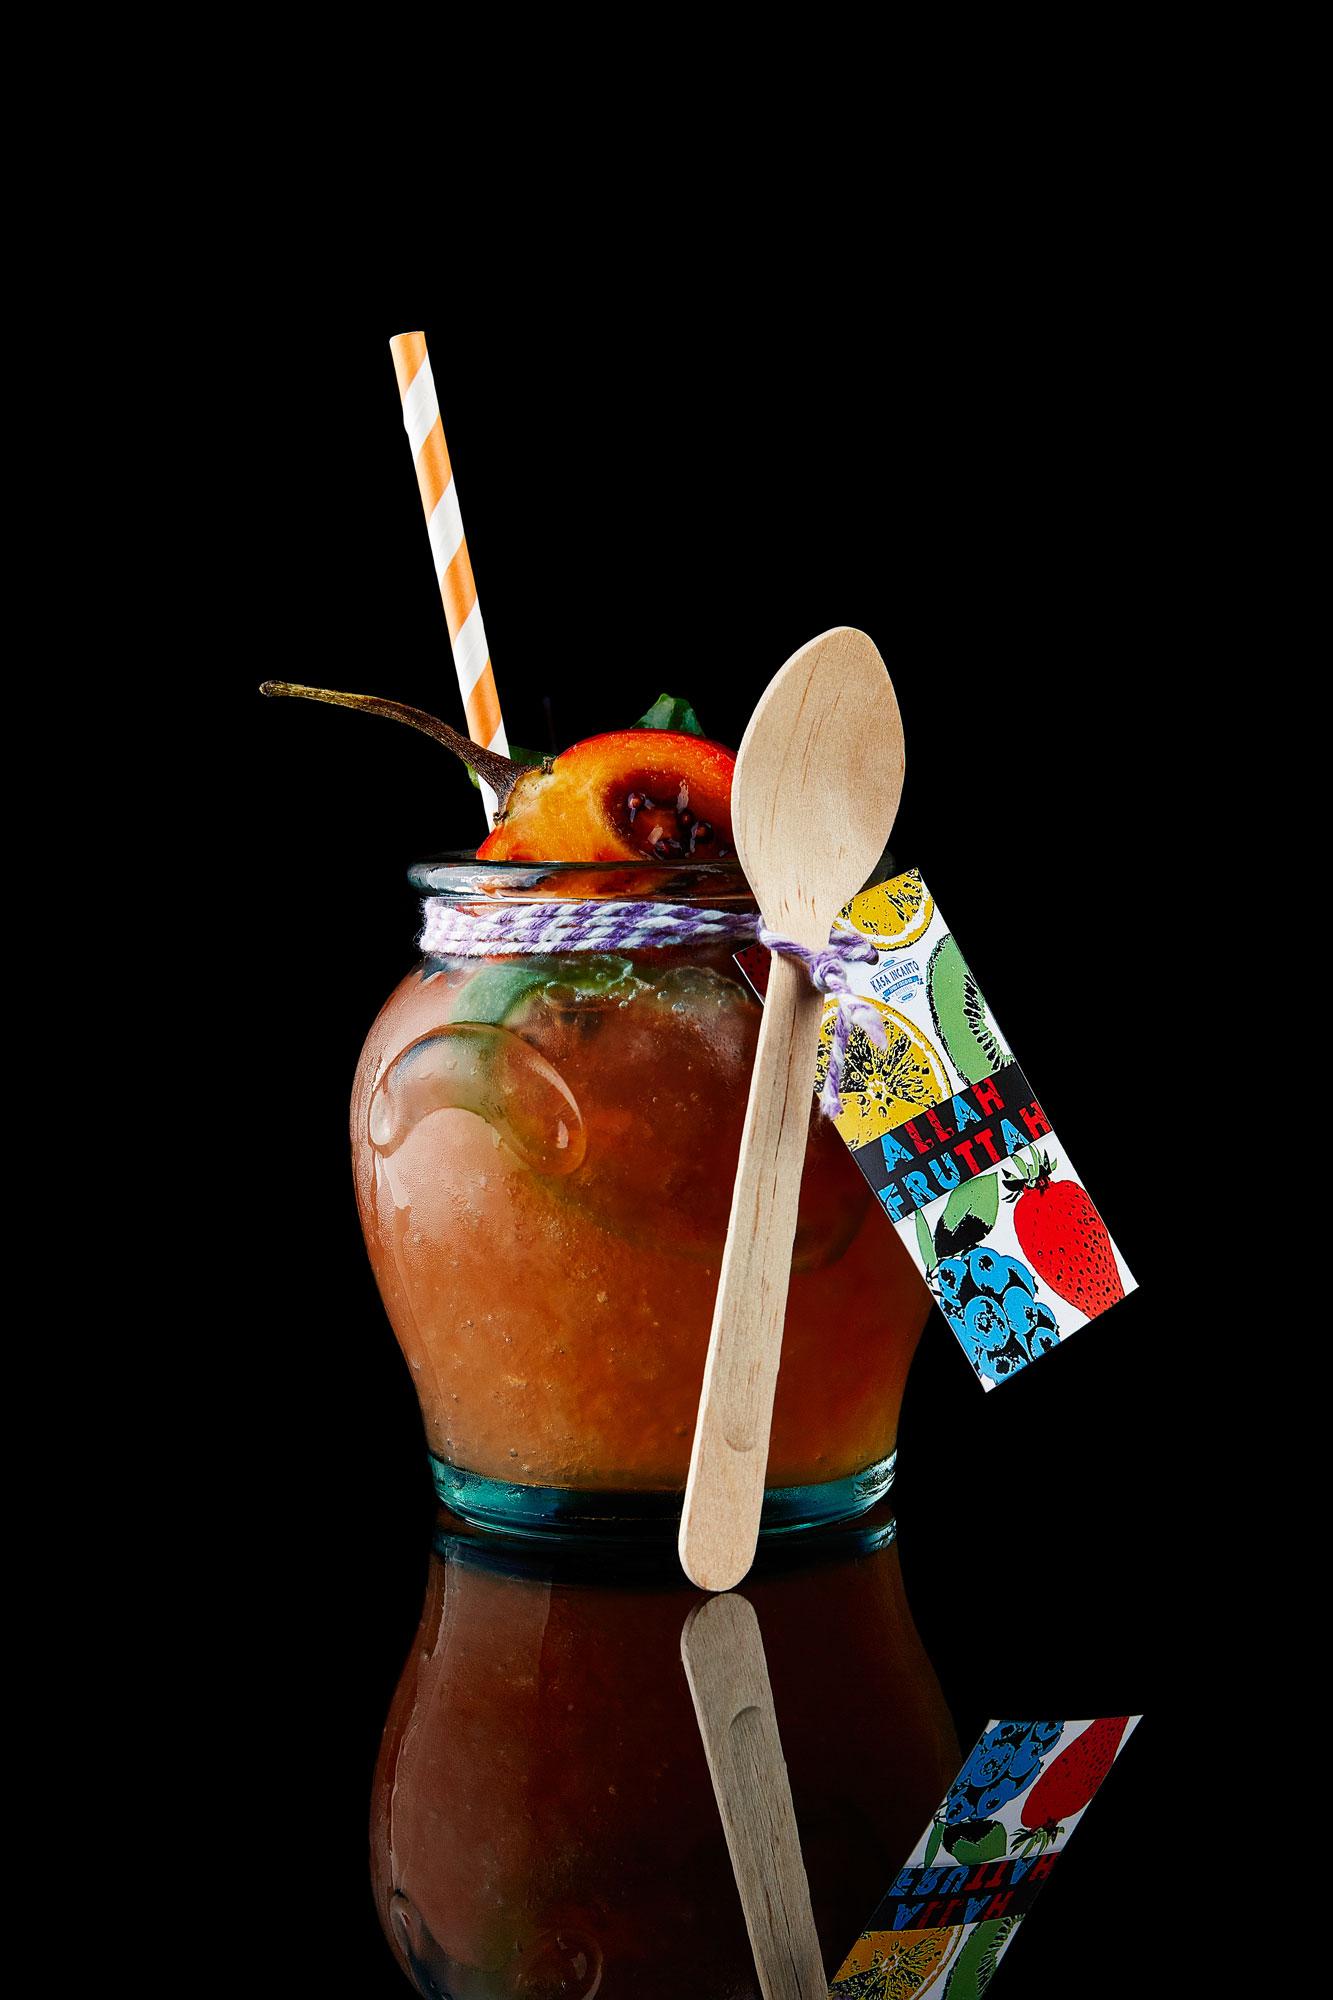 Allah_Fruttah_cocktail_Fabio_Camboni_bartender (2)